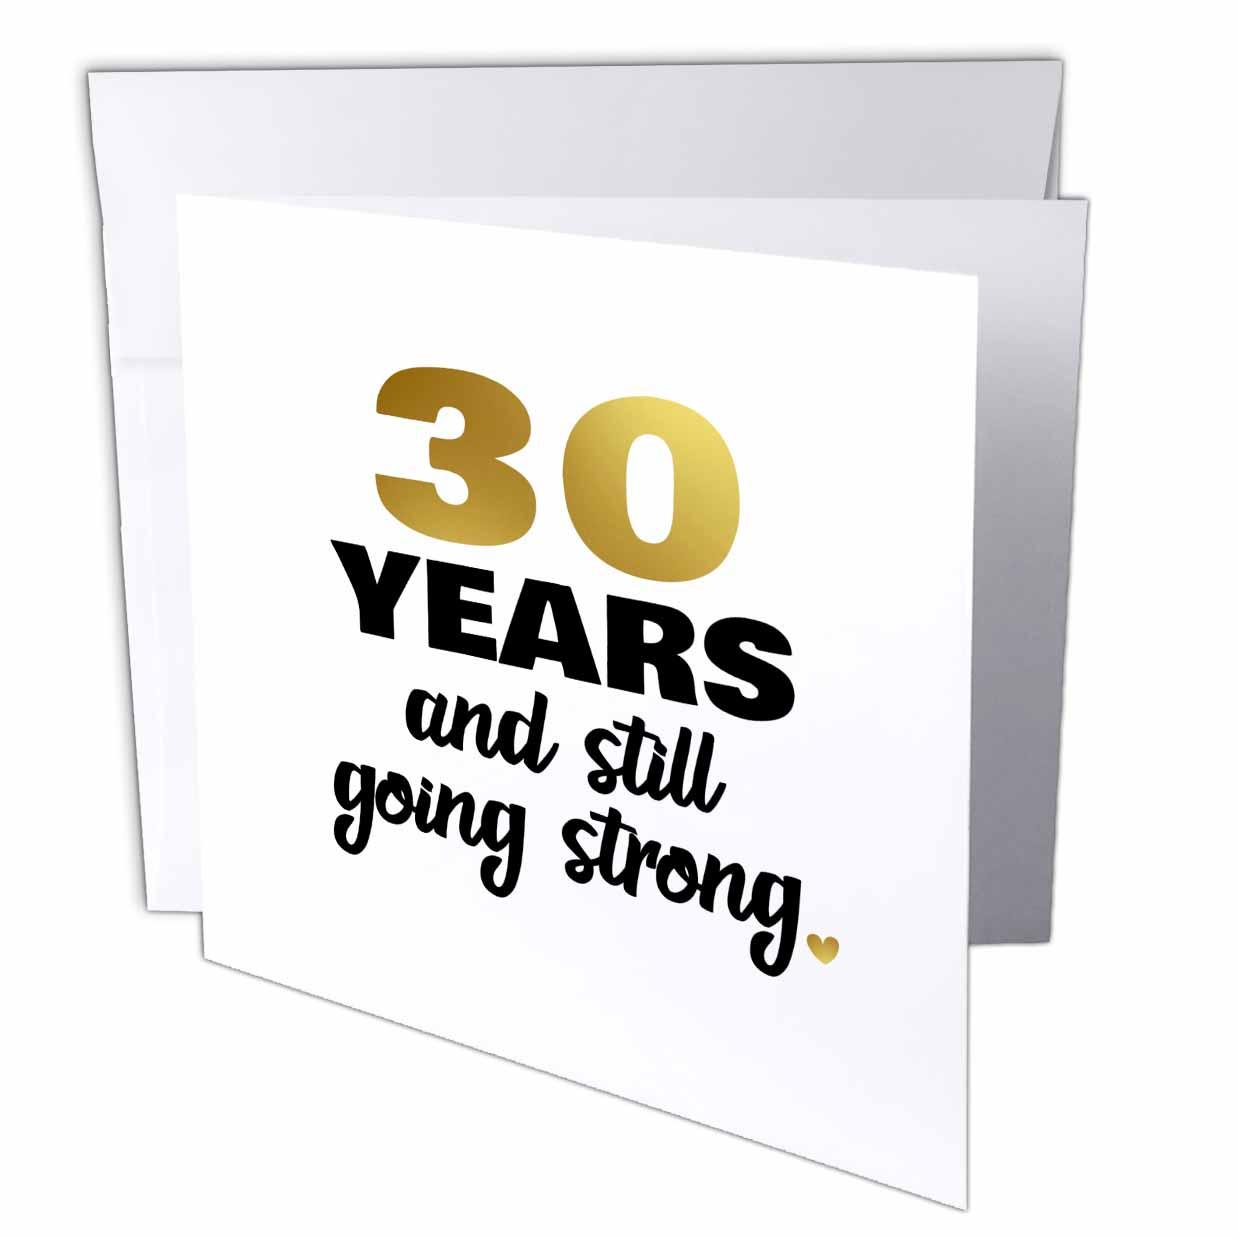 3drose 30 Years Still Going Strong Thirtieth 30th Wedding Anniversary Gift Greeting Card 6 By 6 Inch Walmart Com Walmart Com